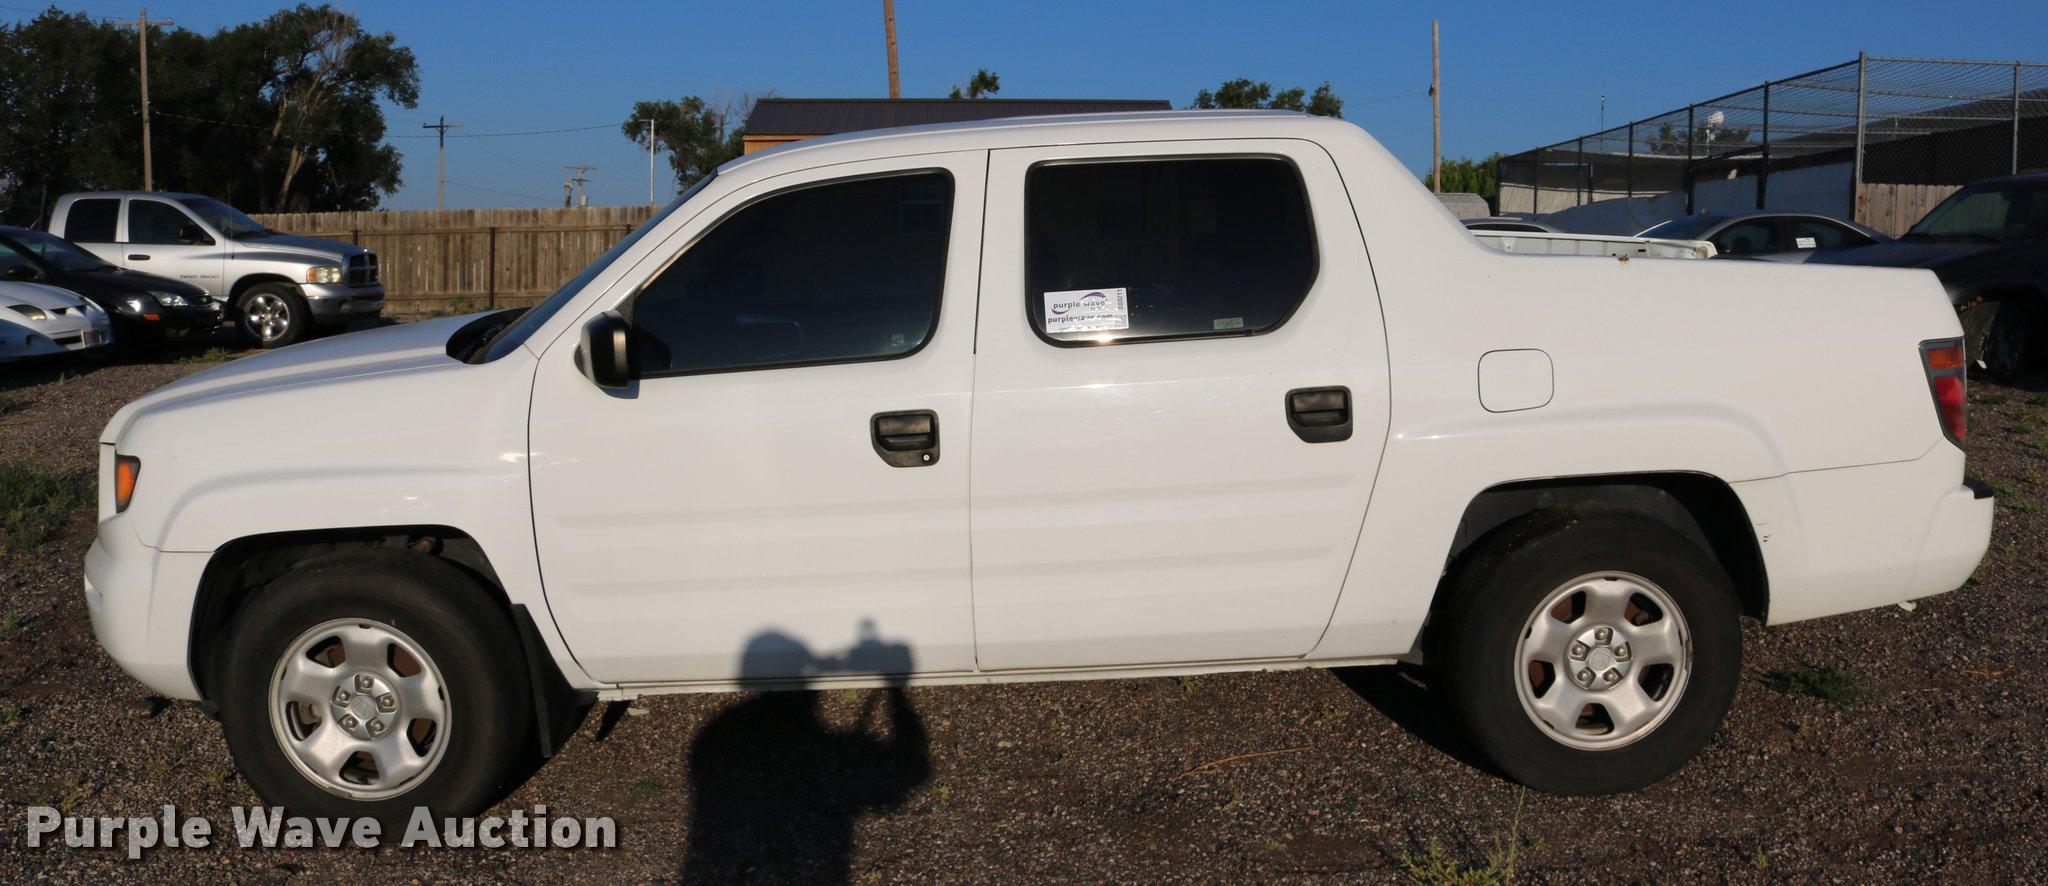 ridgeline listings honda auto express credit